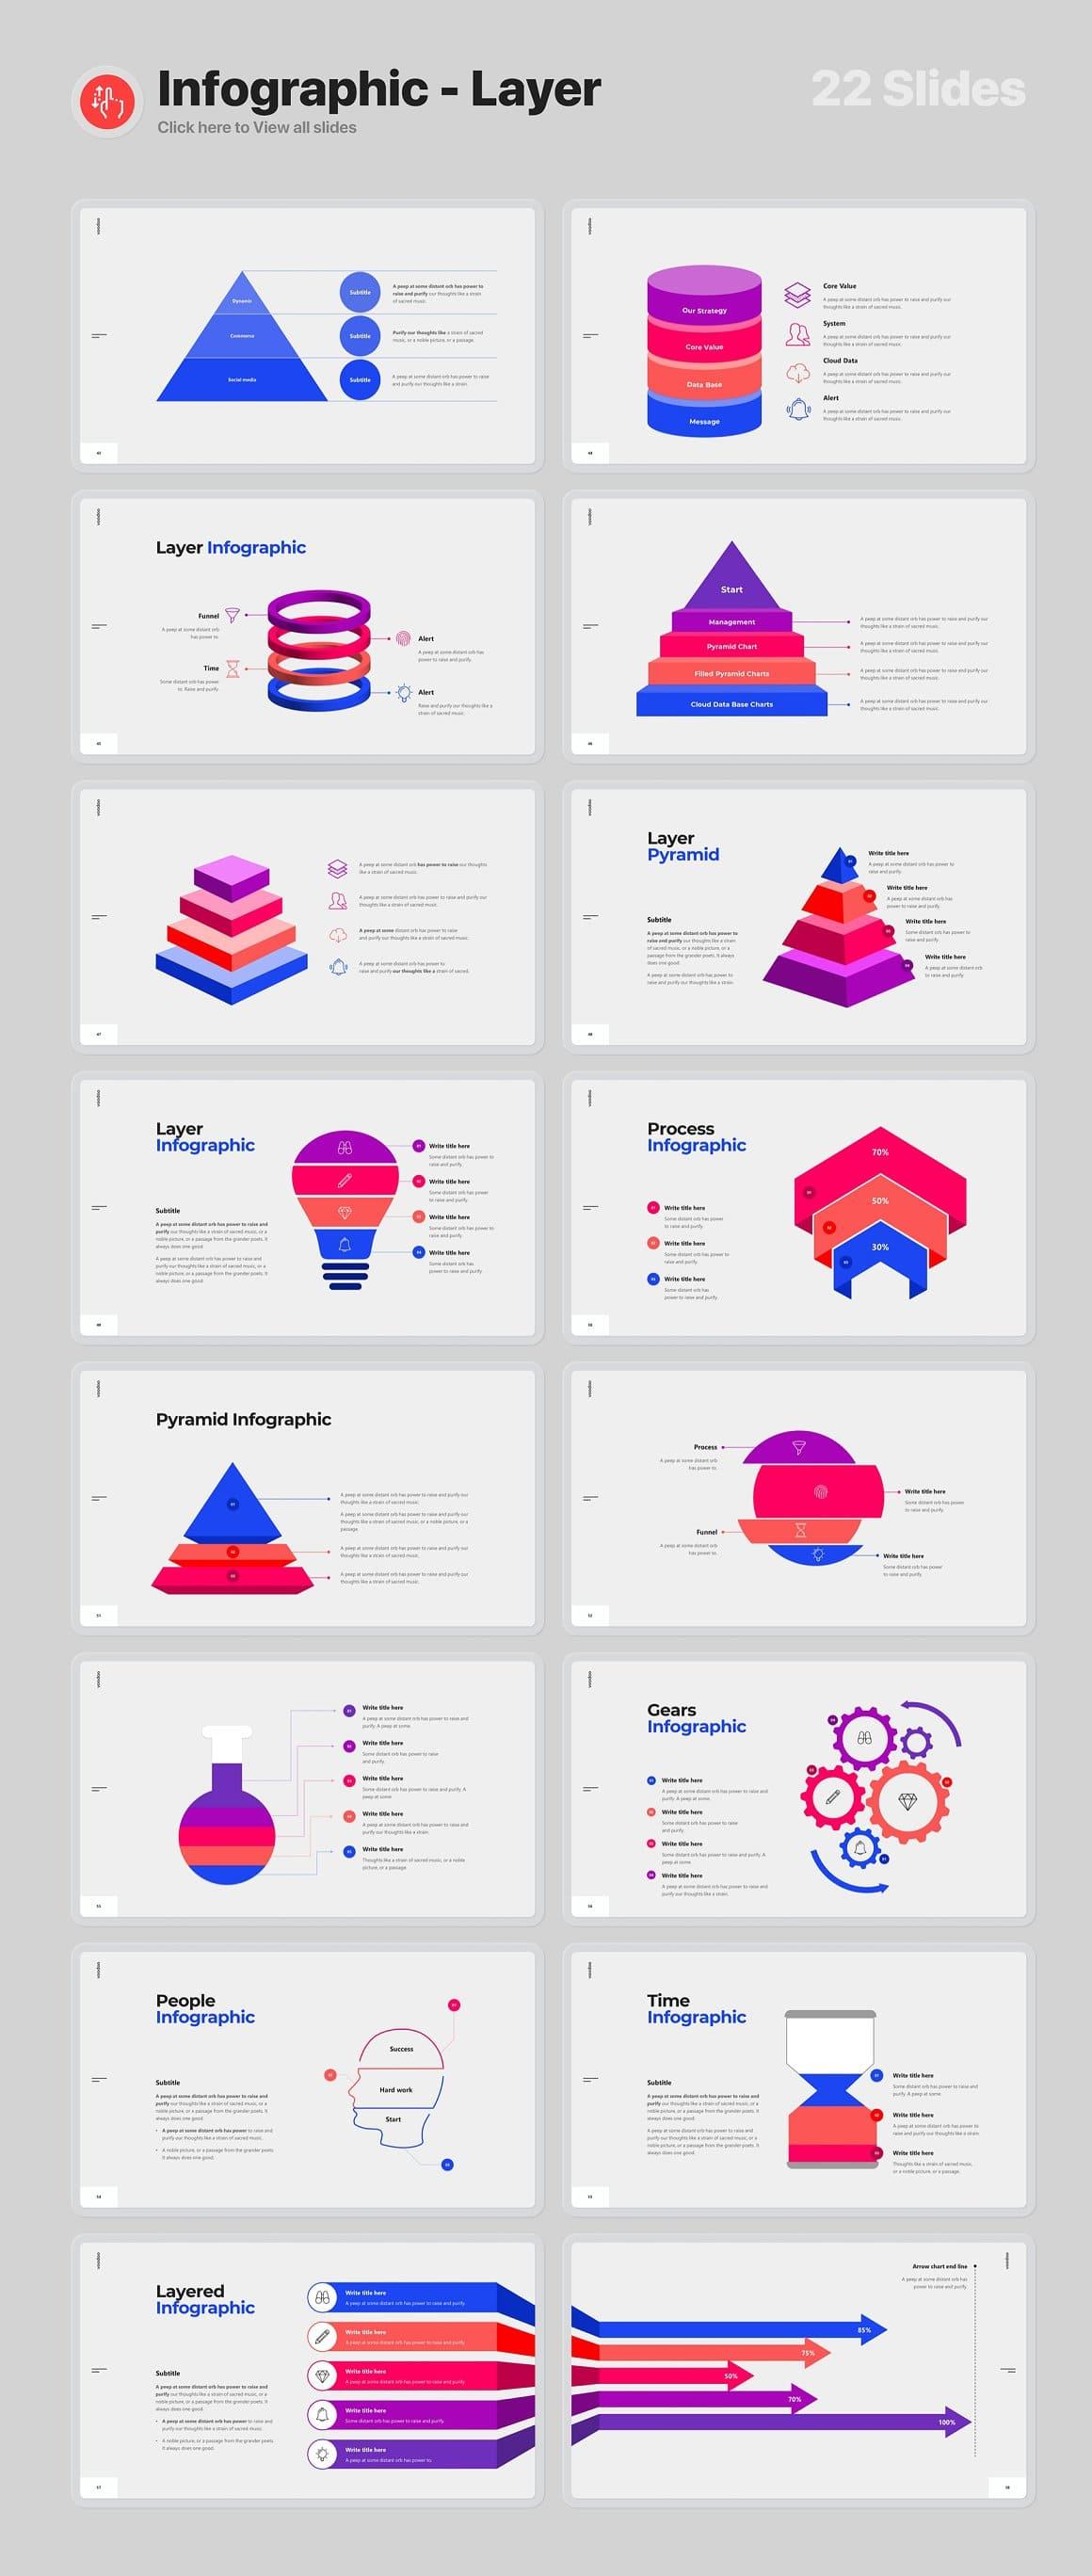 22 Slides Infographic - Layer Voodoo Presentation 4.0.